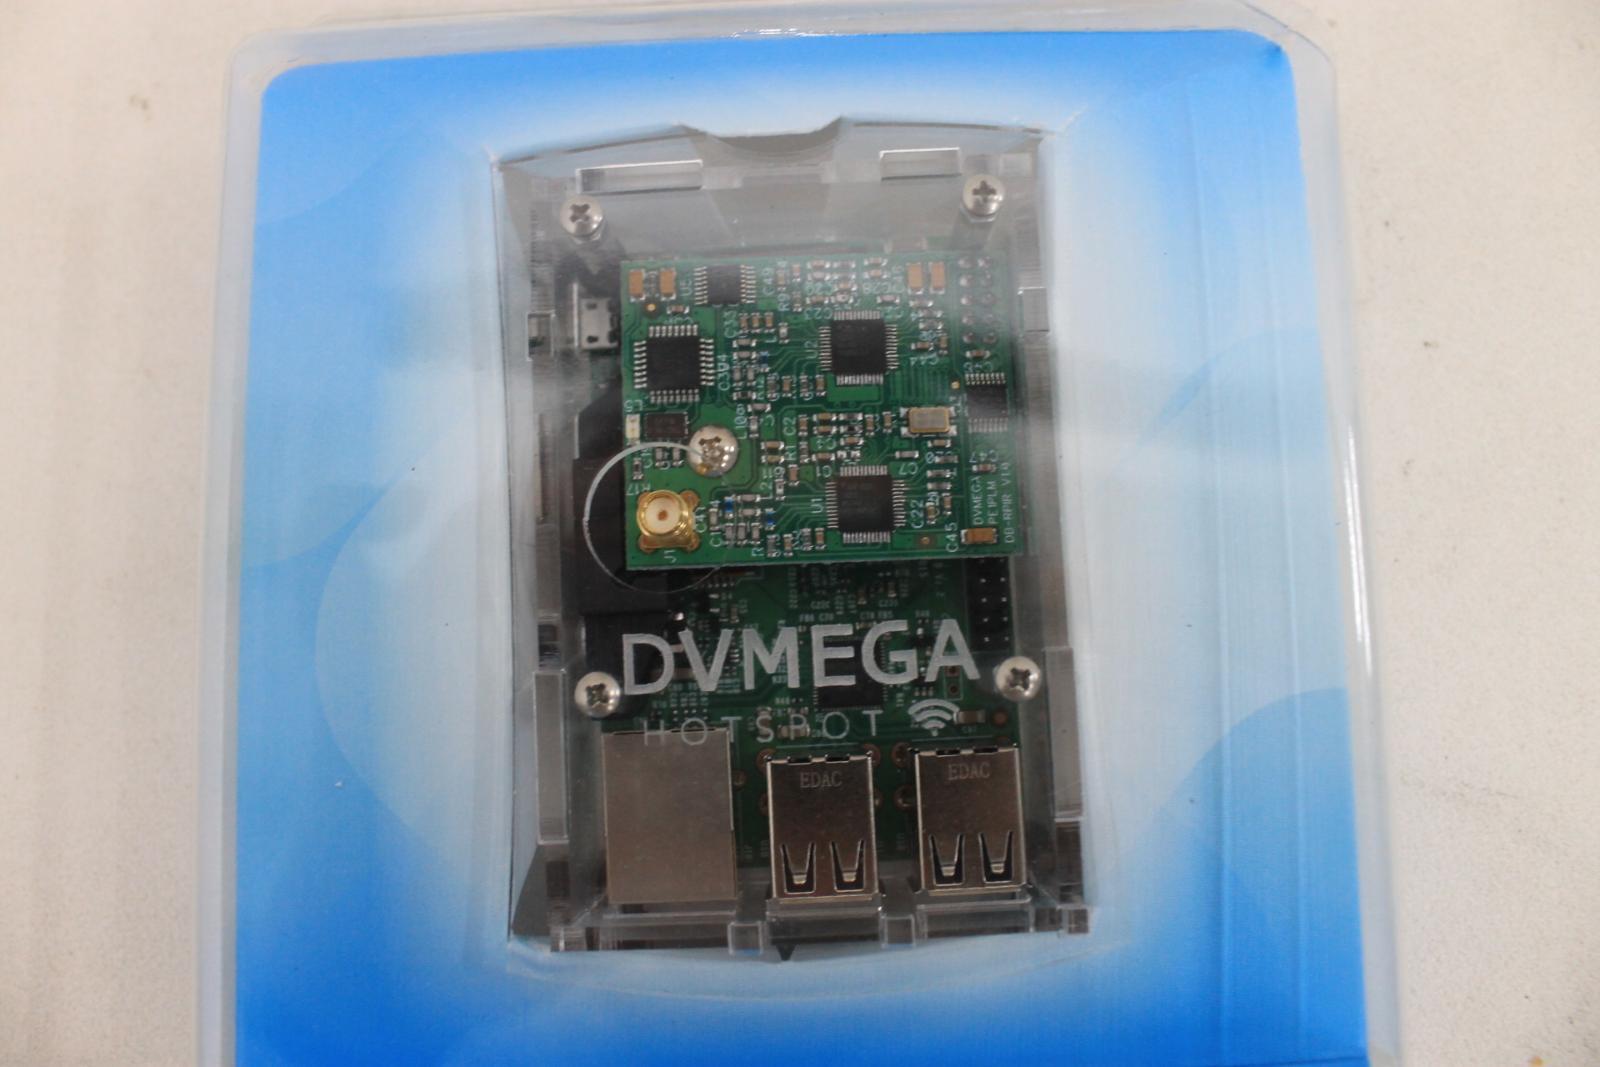 NEW DVMEGA HOT SPOT Dual band VHF/UHF Prebuilt Hotspot Kit For Digital Radios - 11